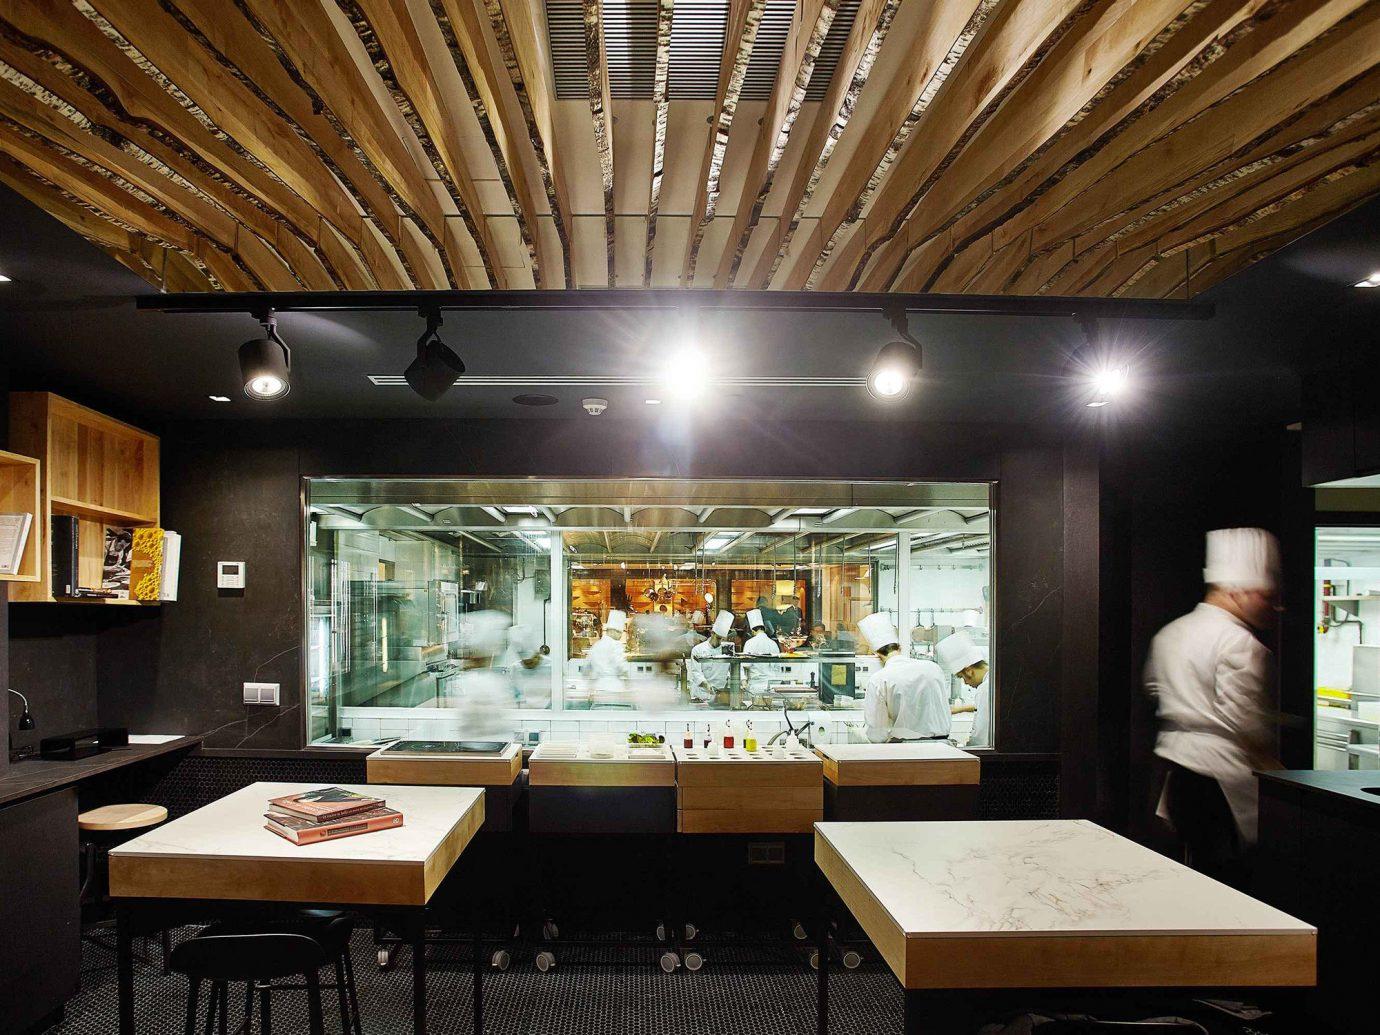 Restaurant in Spain